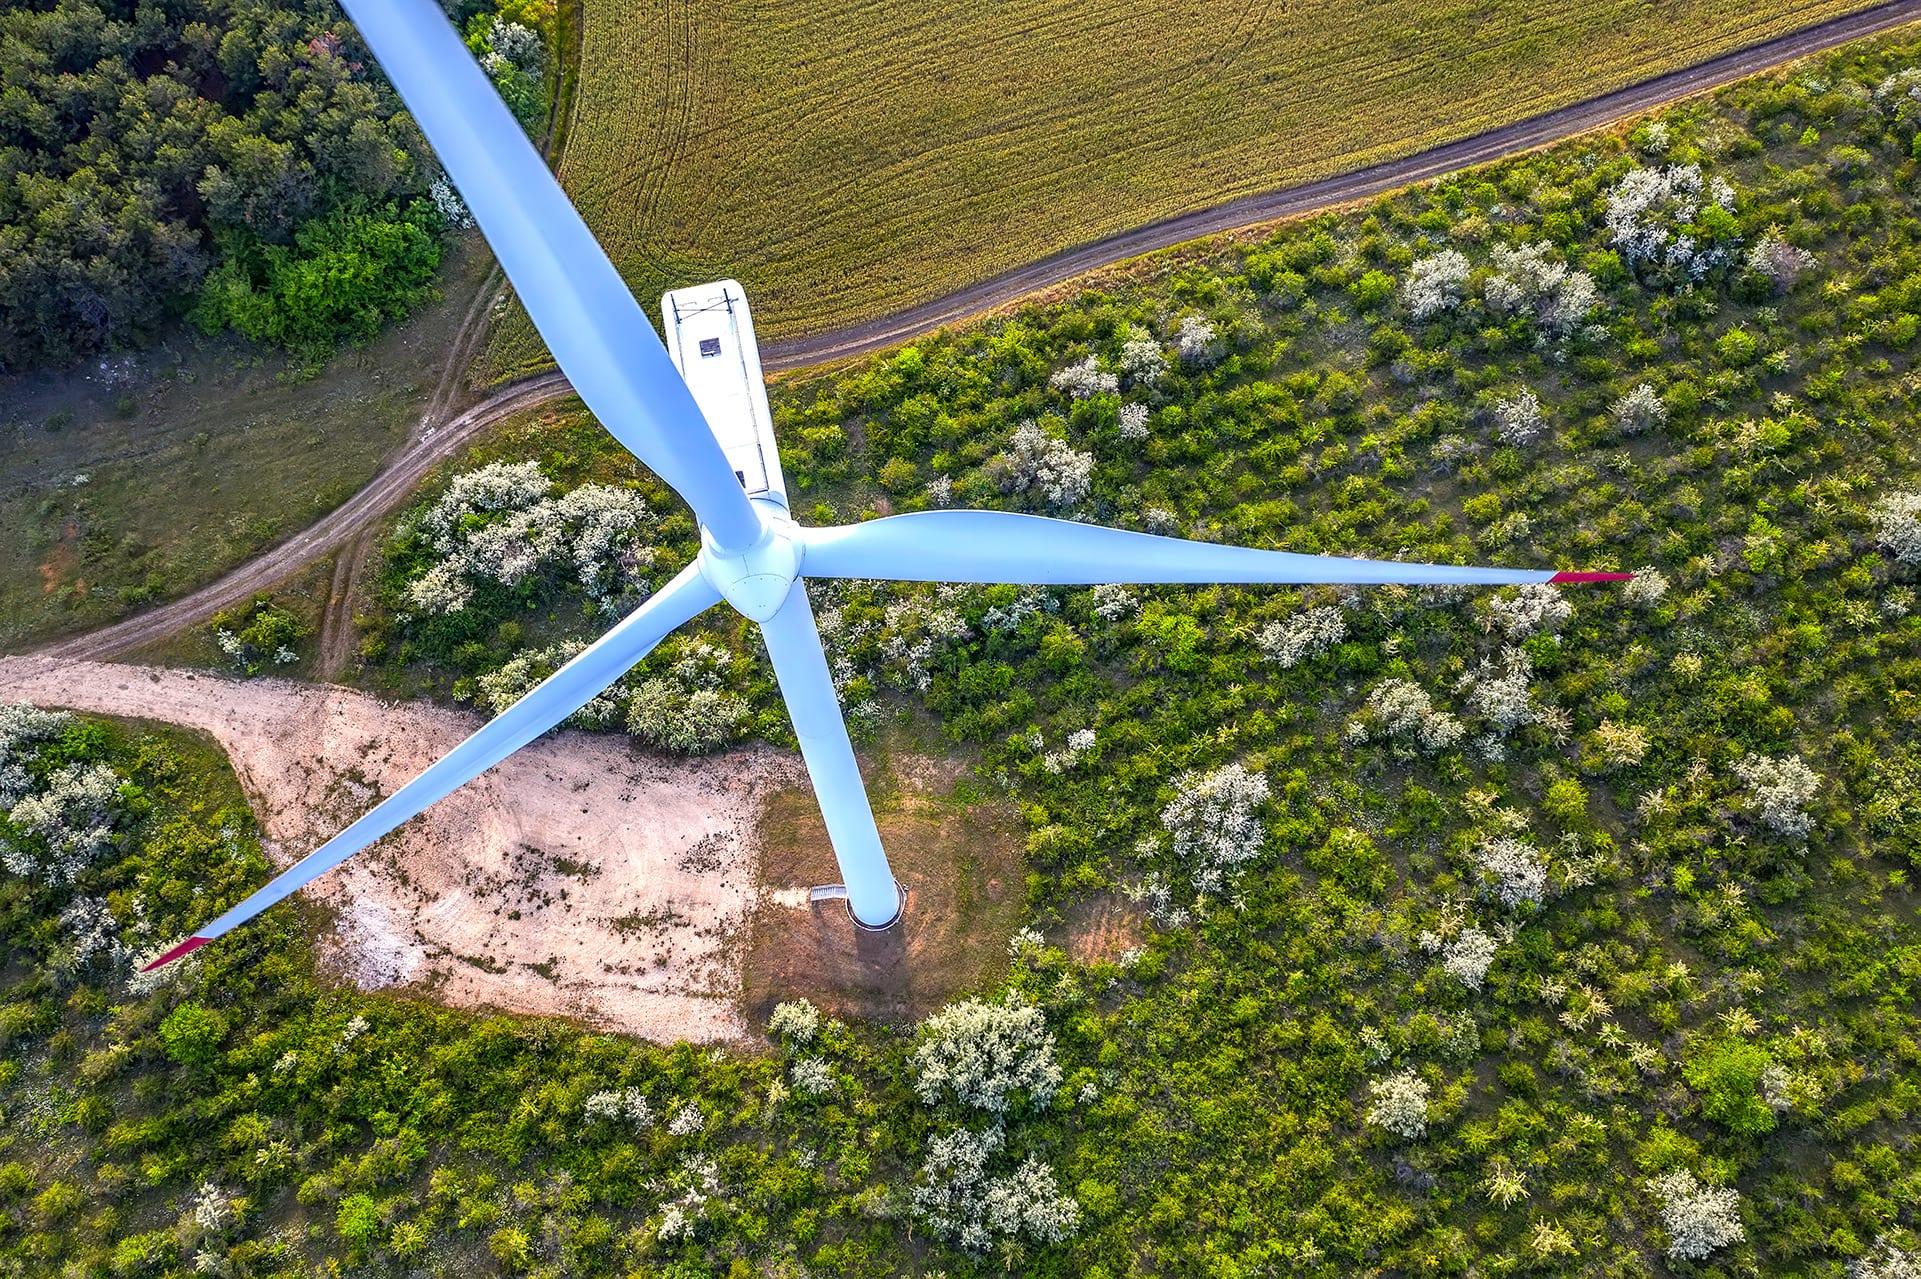 wind-turbine-MRWGU8X